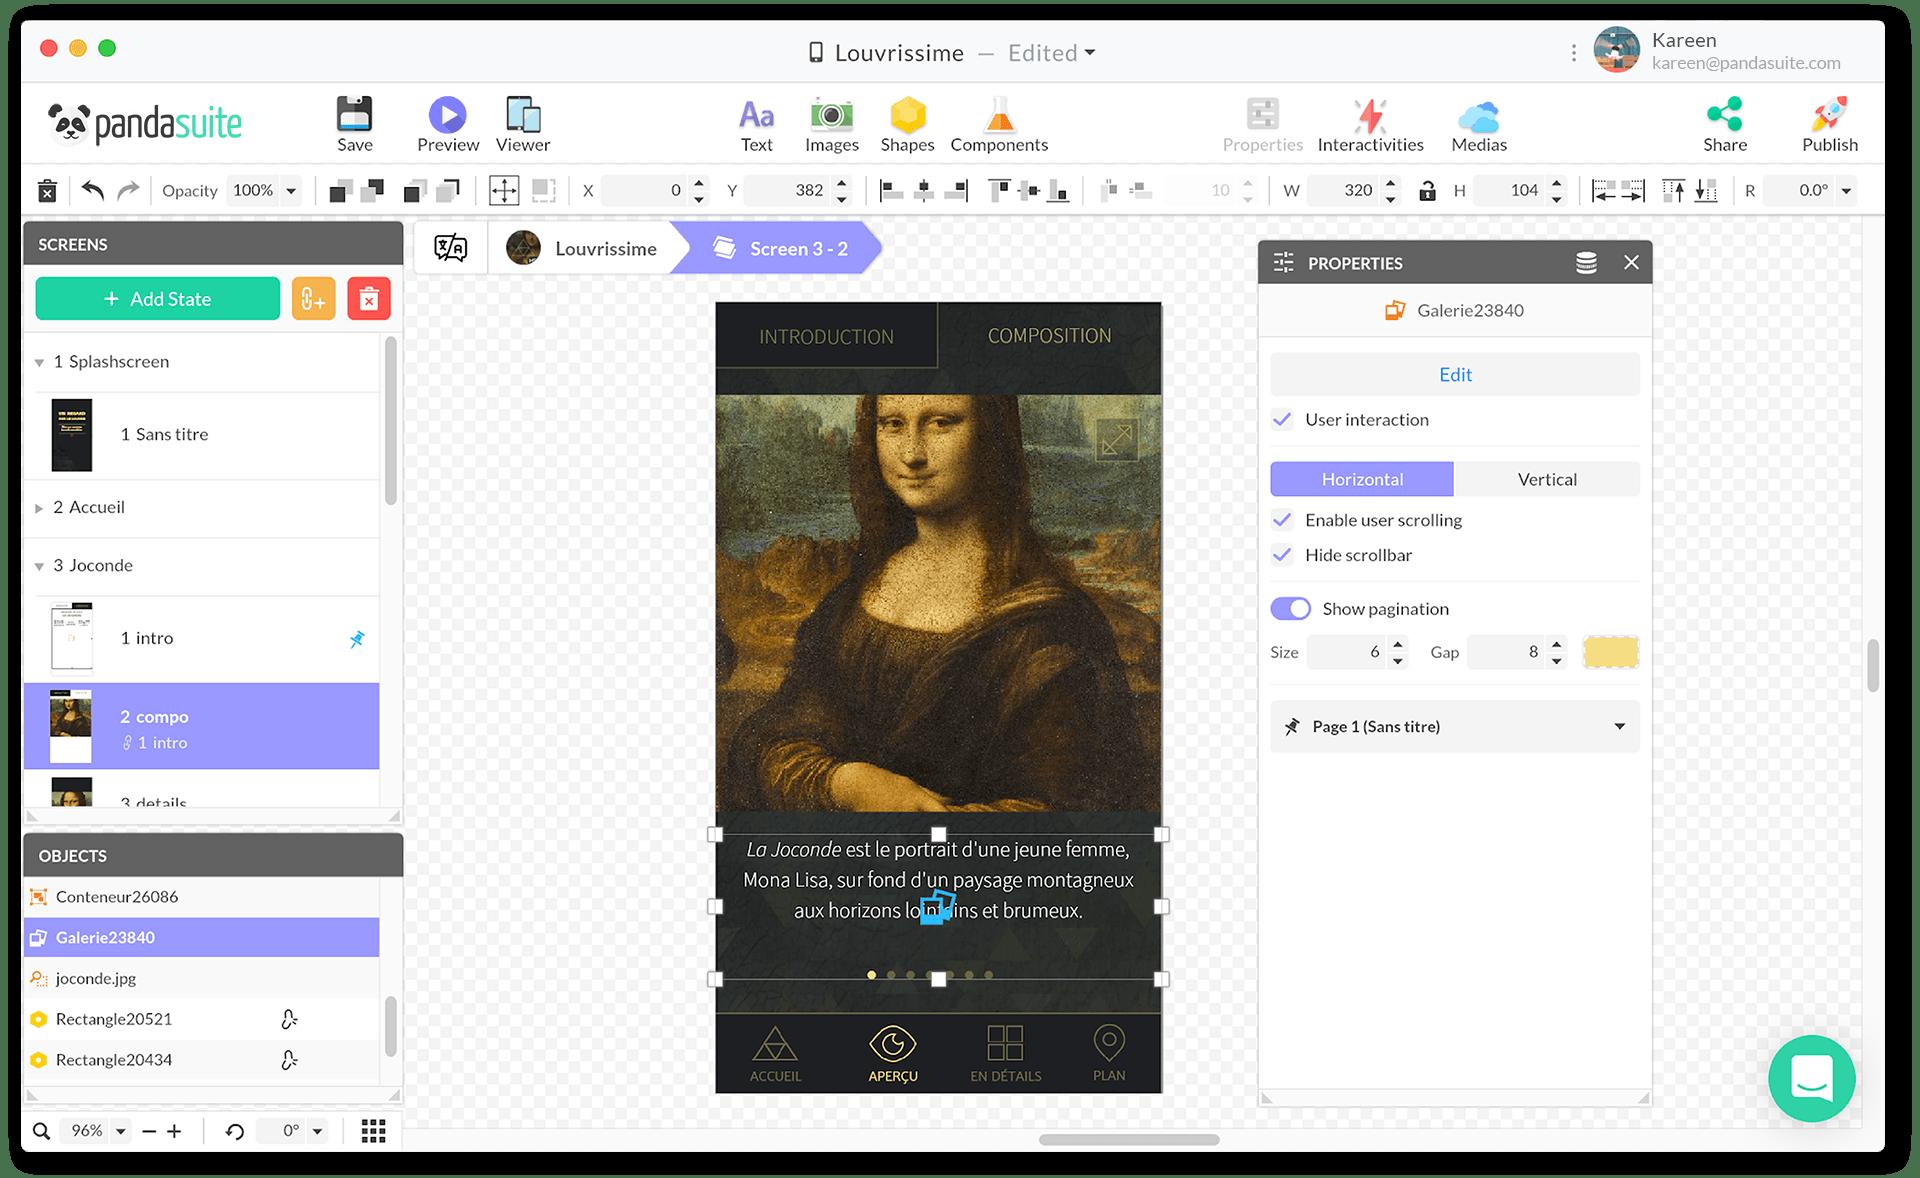 PandaSuite-interactive-design-studio